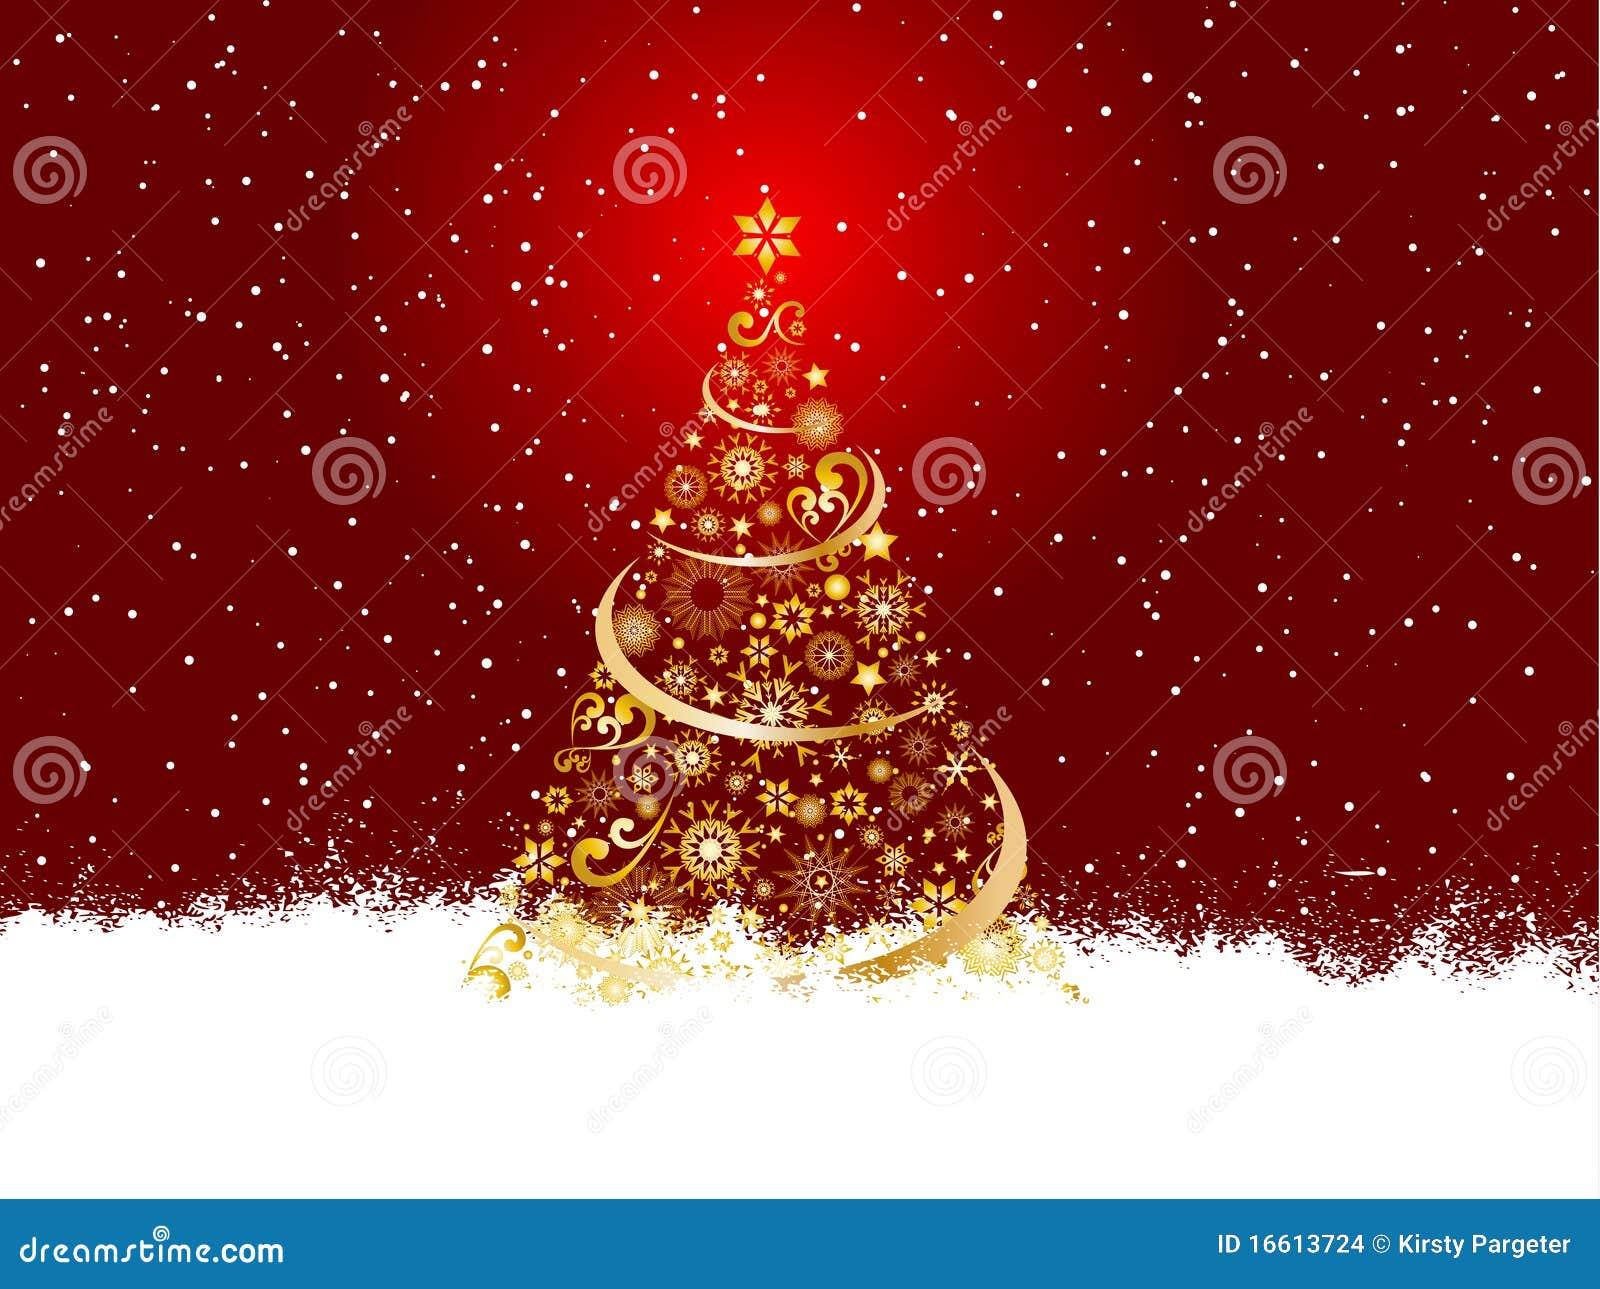 goldener weihnachtsbaum stockbilder bild 16613724. Black Bedroom Furniture Sets. Home Design Ideas